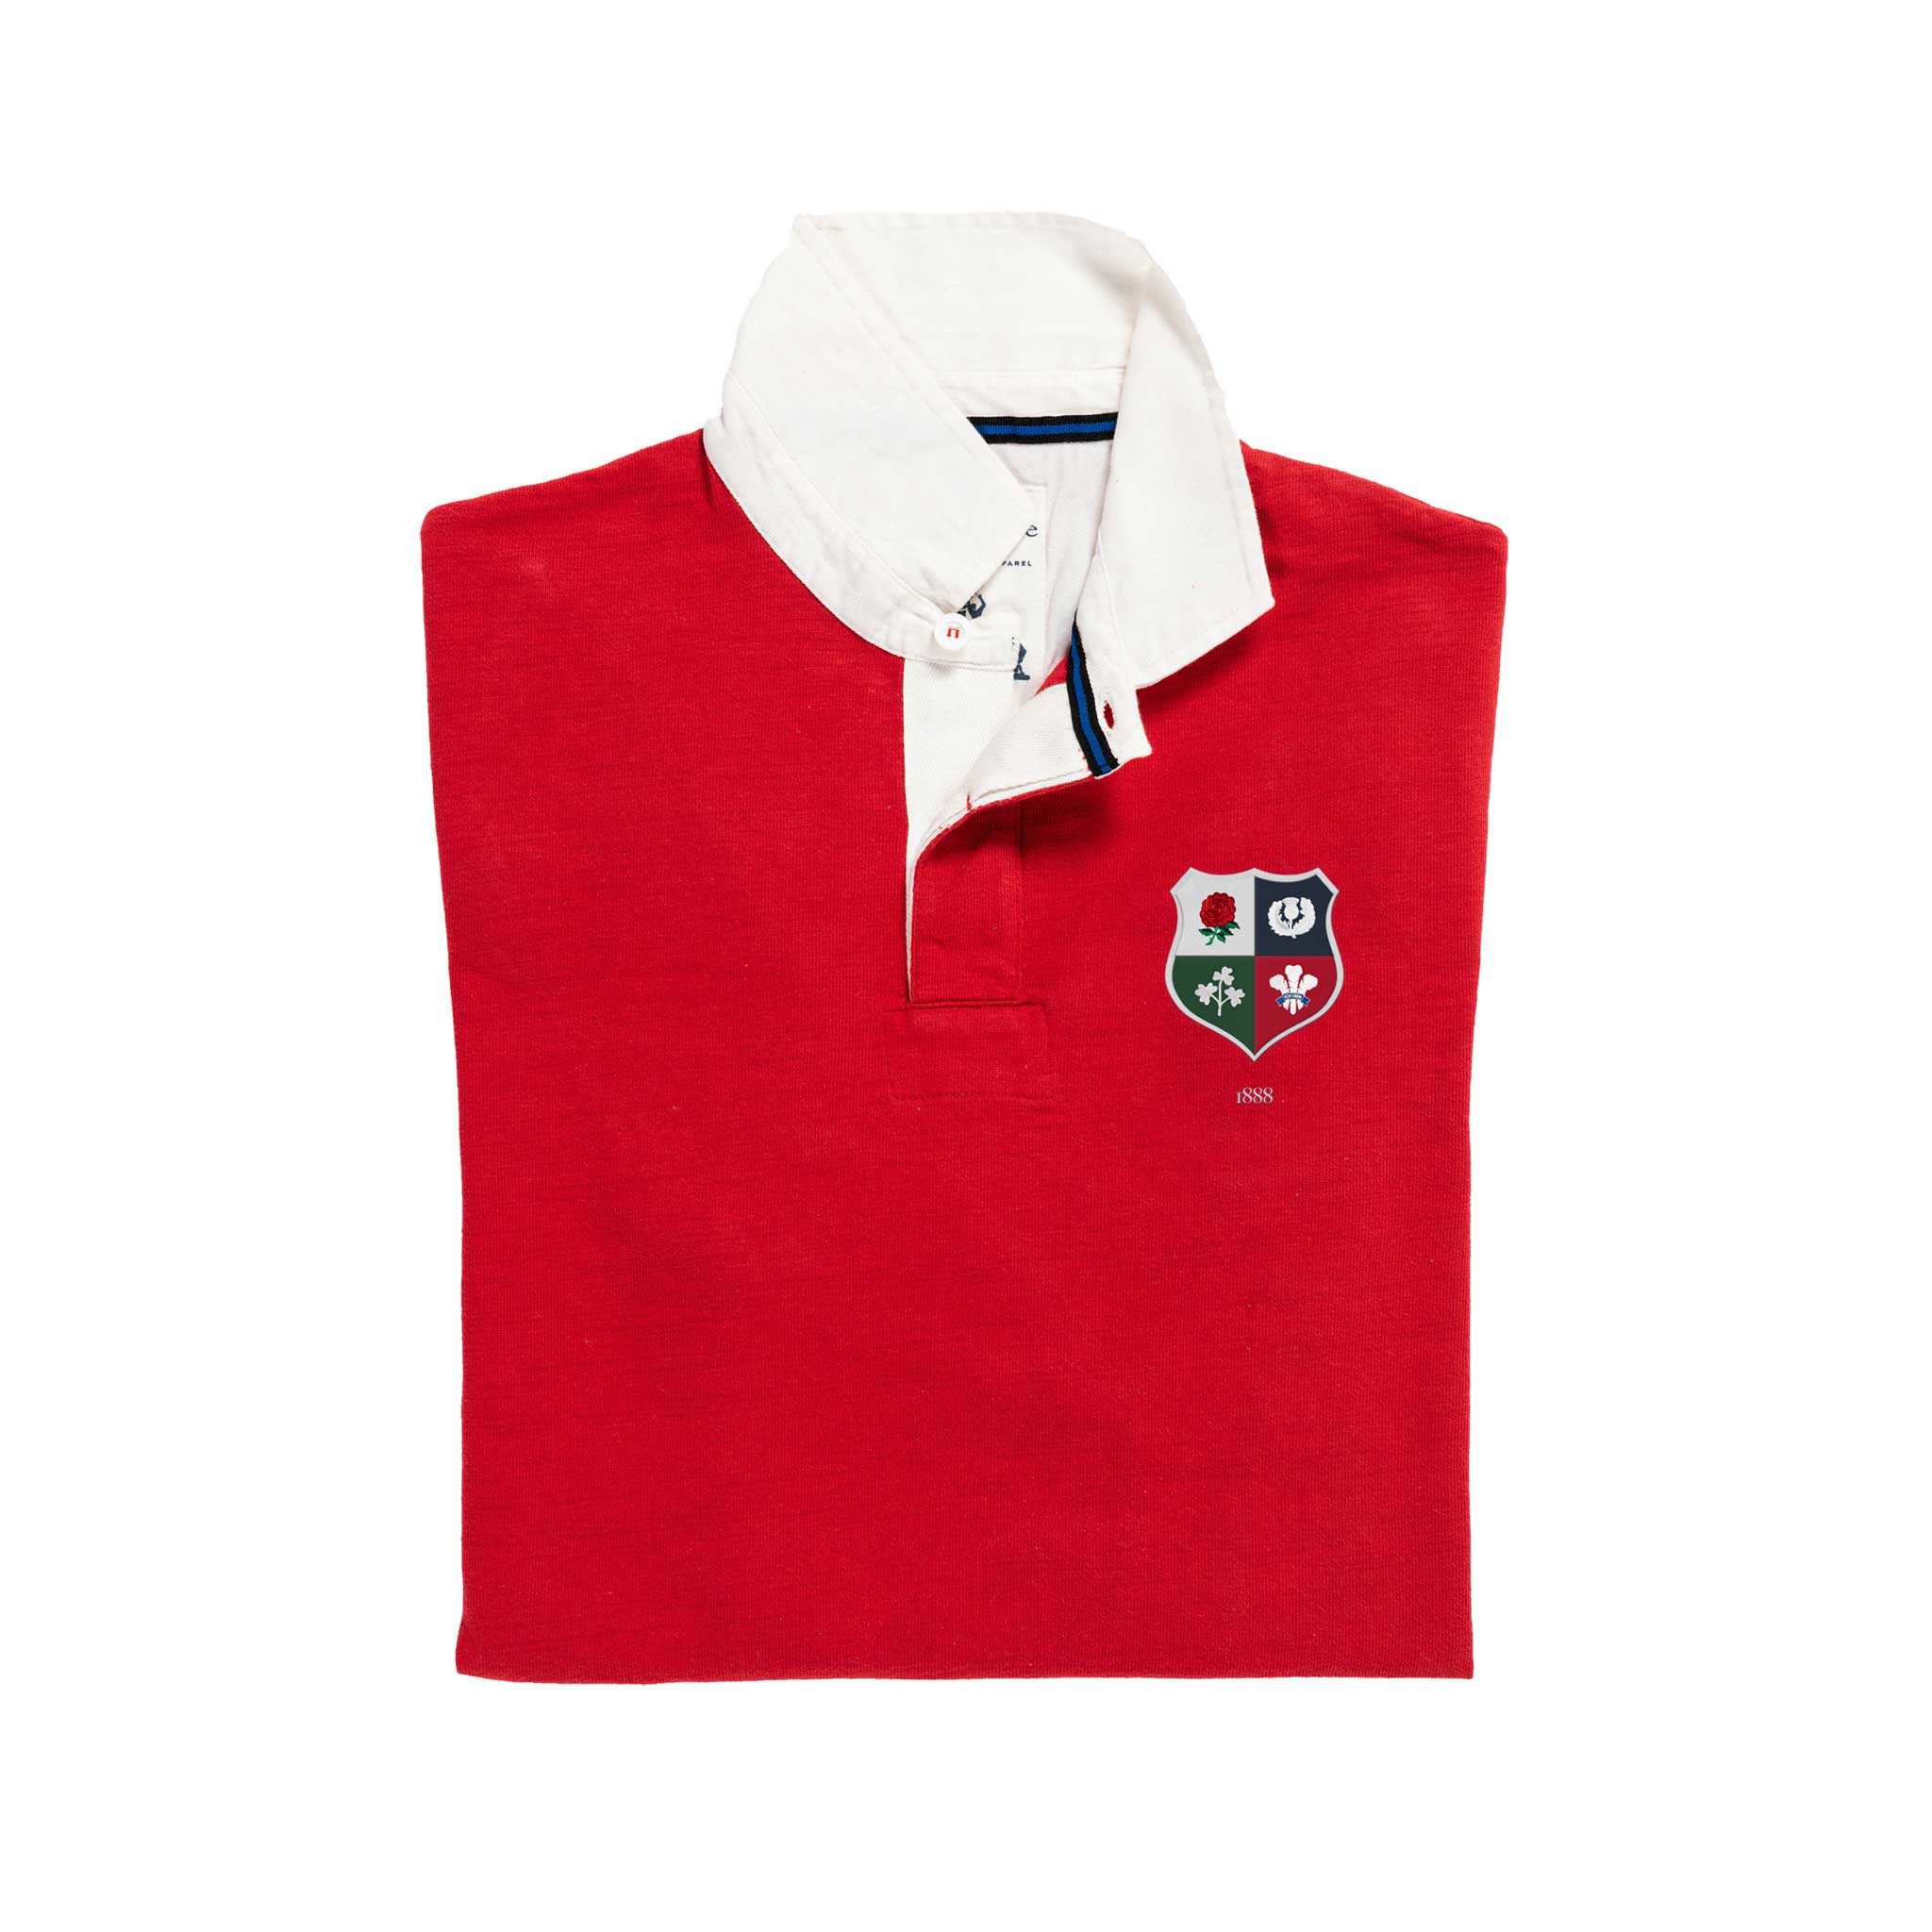 British and Irish Lions 1888 Rugby Shirt_Folded